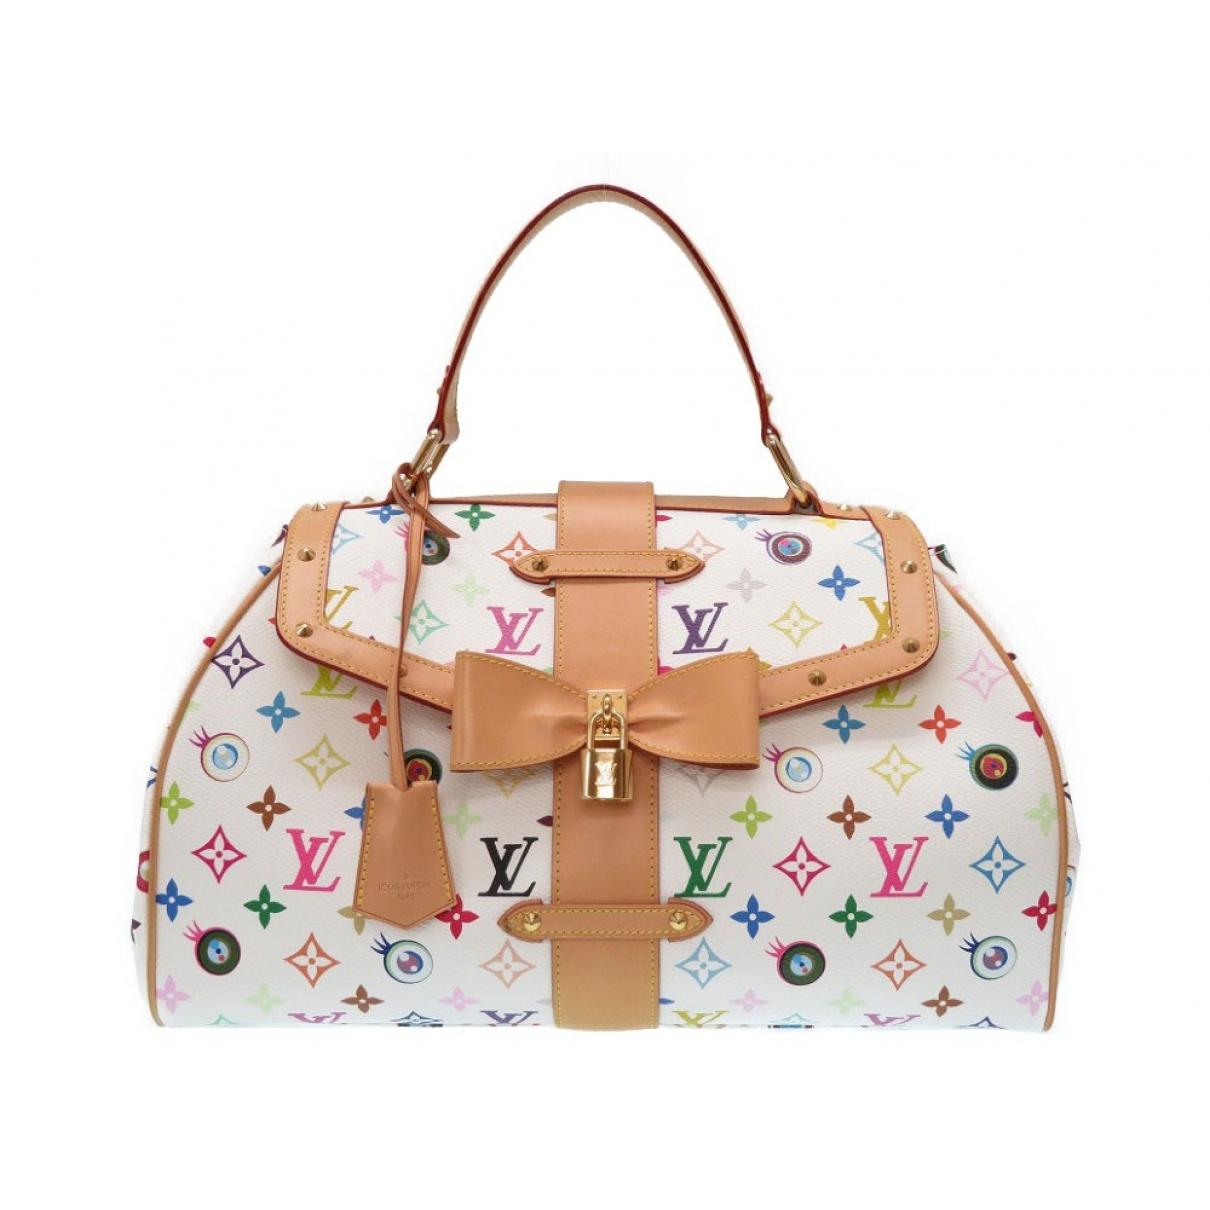 Louis Vuitton Eye love you  White Cloth handbag for Women \N